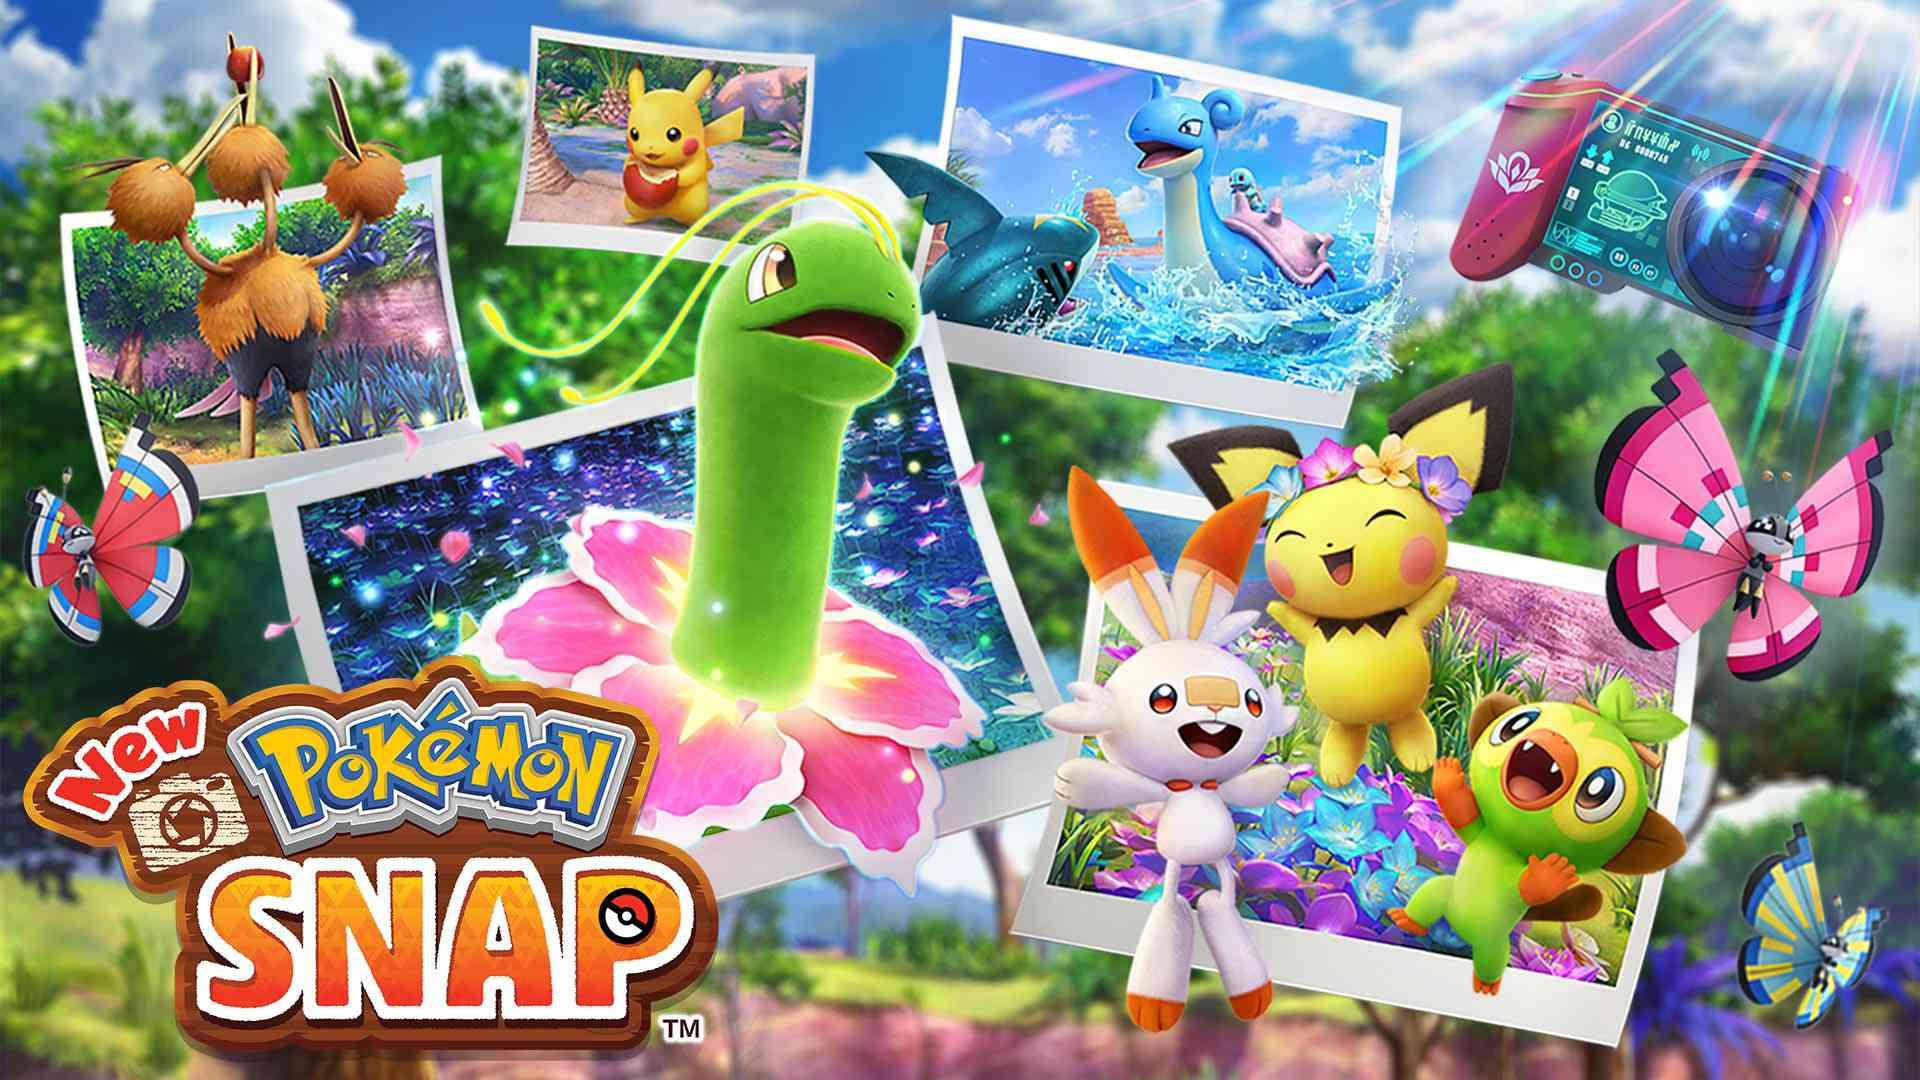 Hero art from 'New Pokemon Snap'